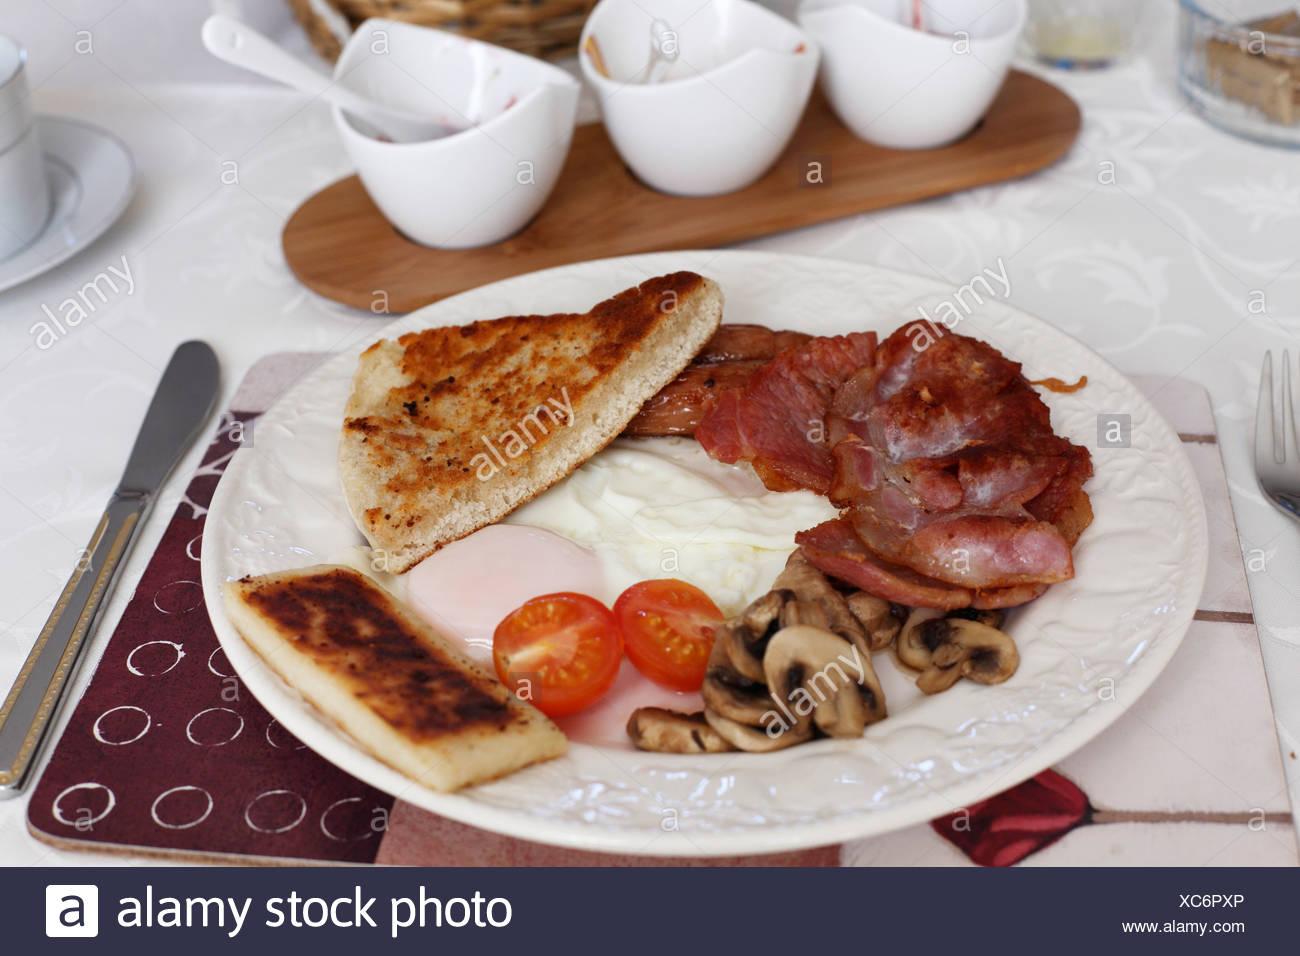 United Kingdom, Northern Ireland, Irish Breakfast in plate, close up - Stock Image